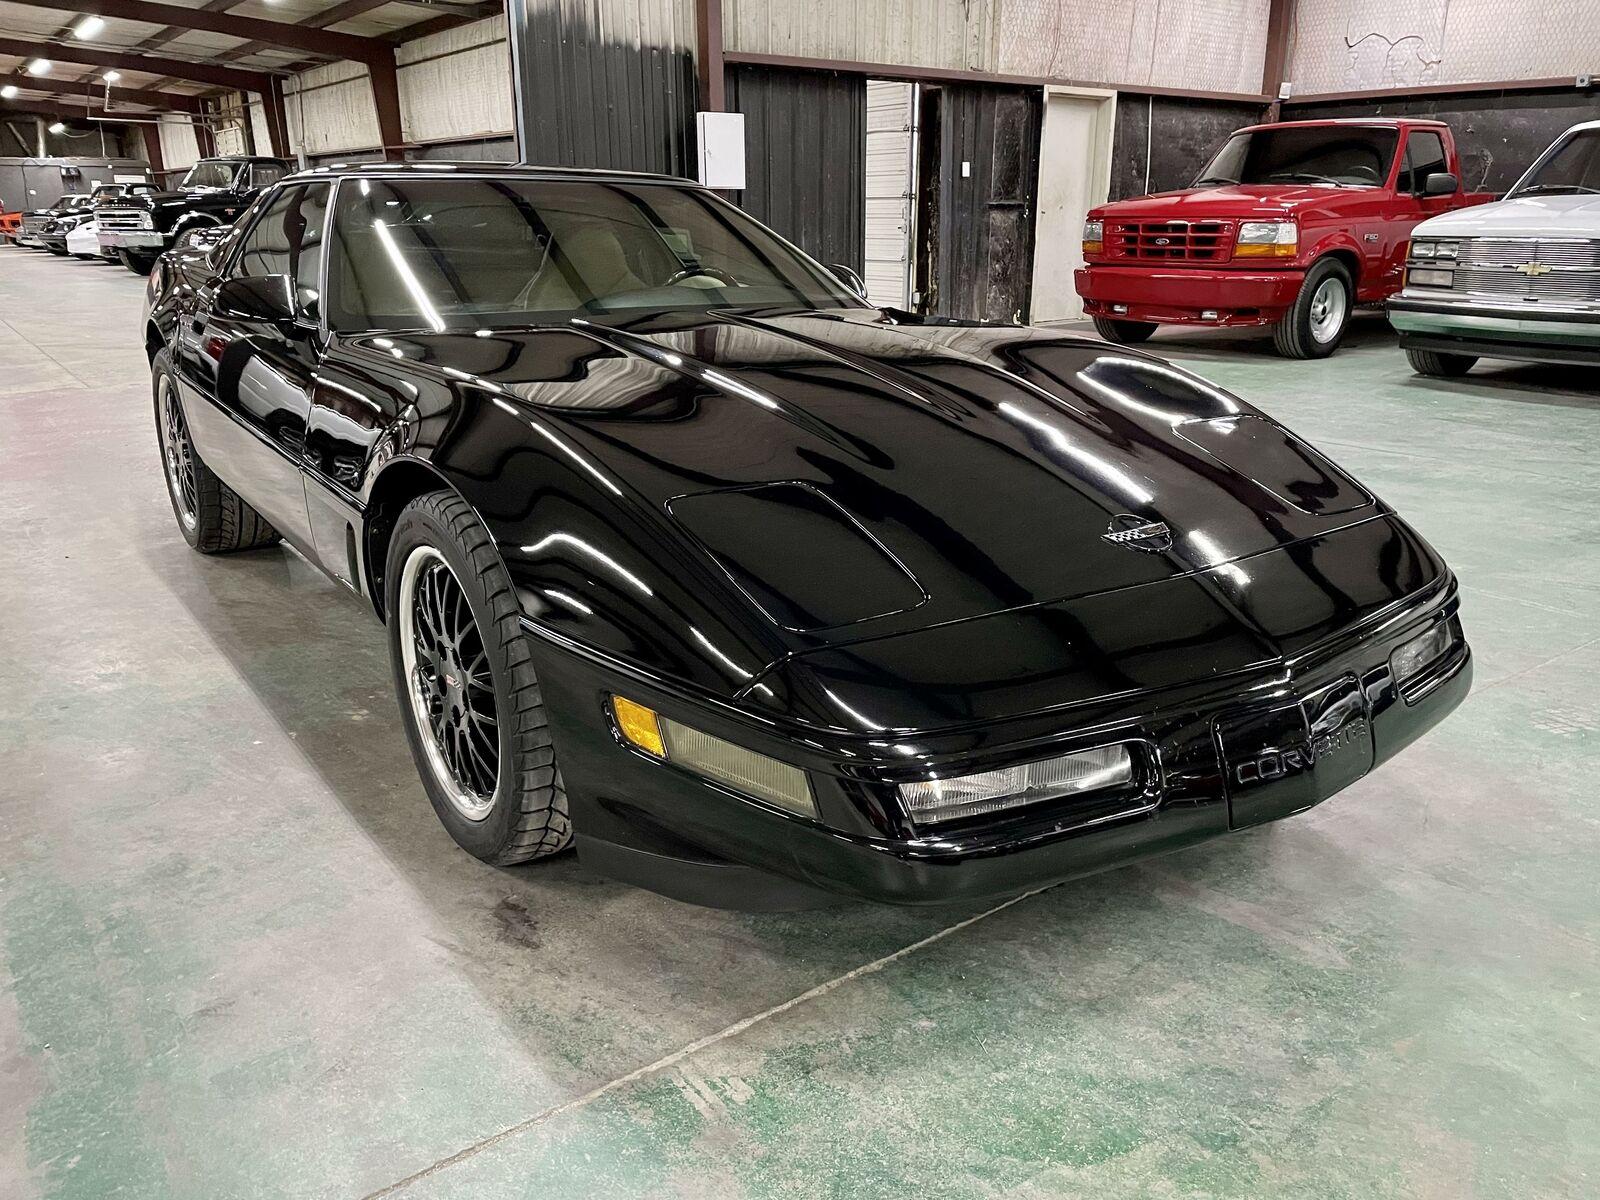 1996 Black Chevrolet Corvette     C4 Corvette Photo 7